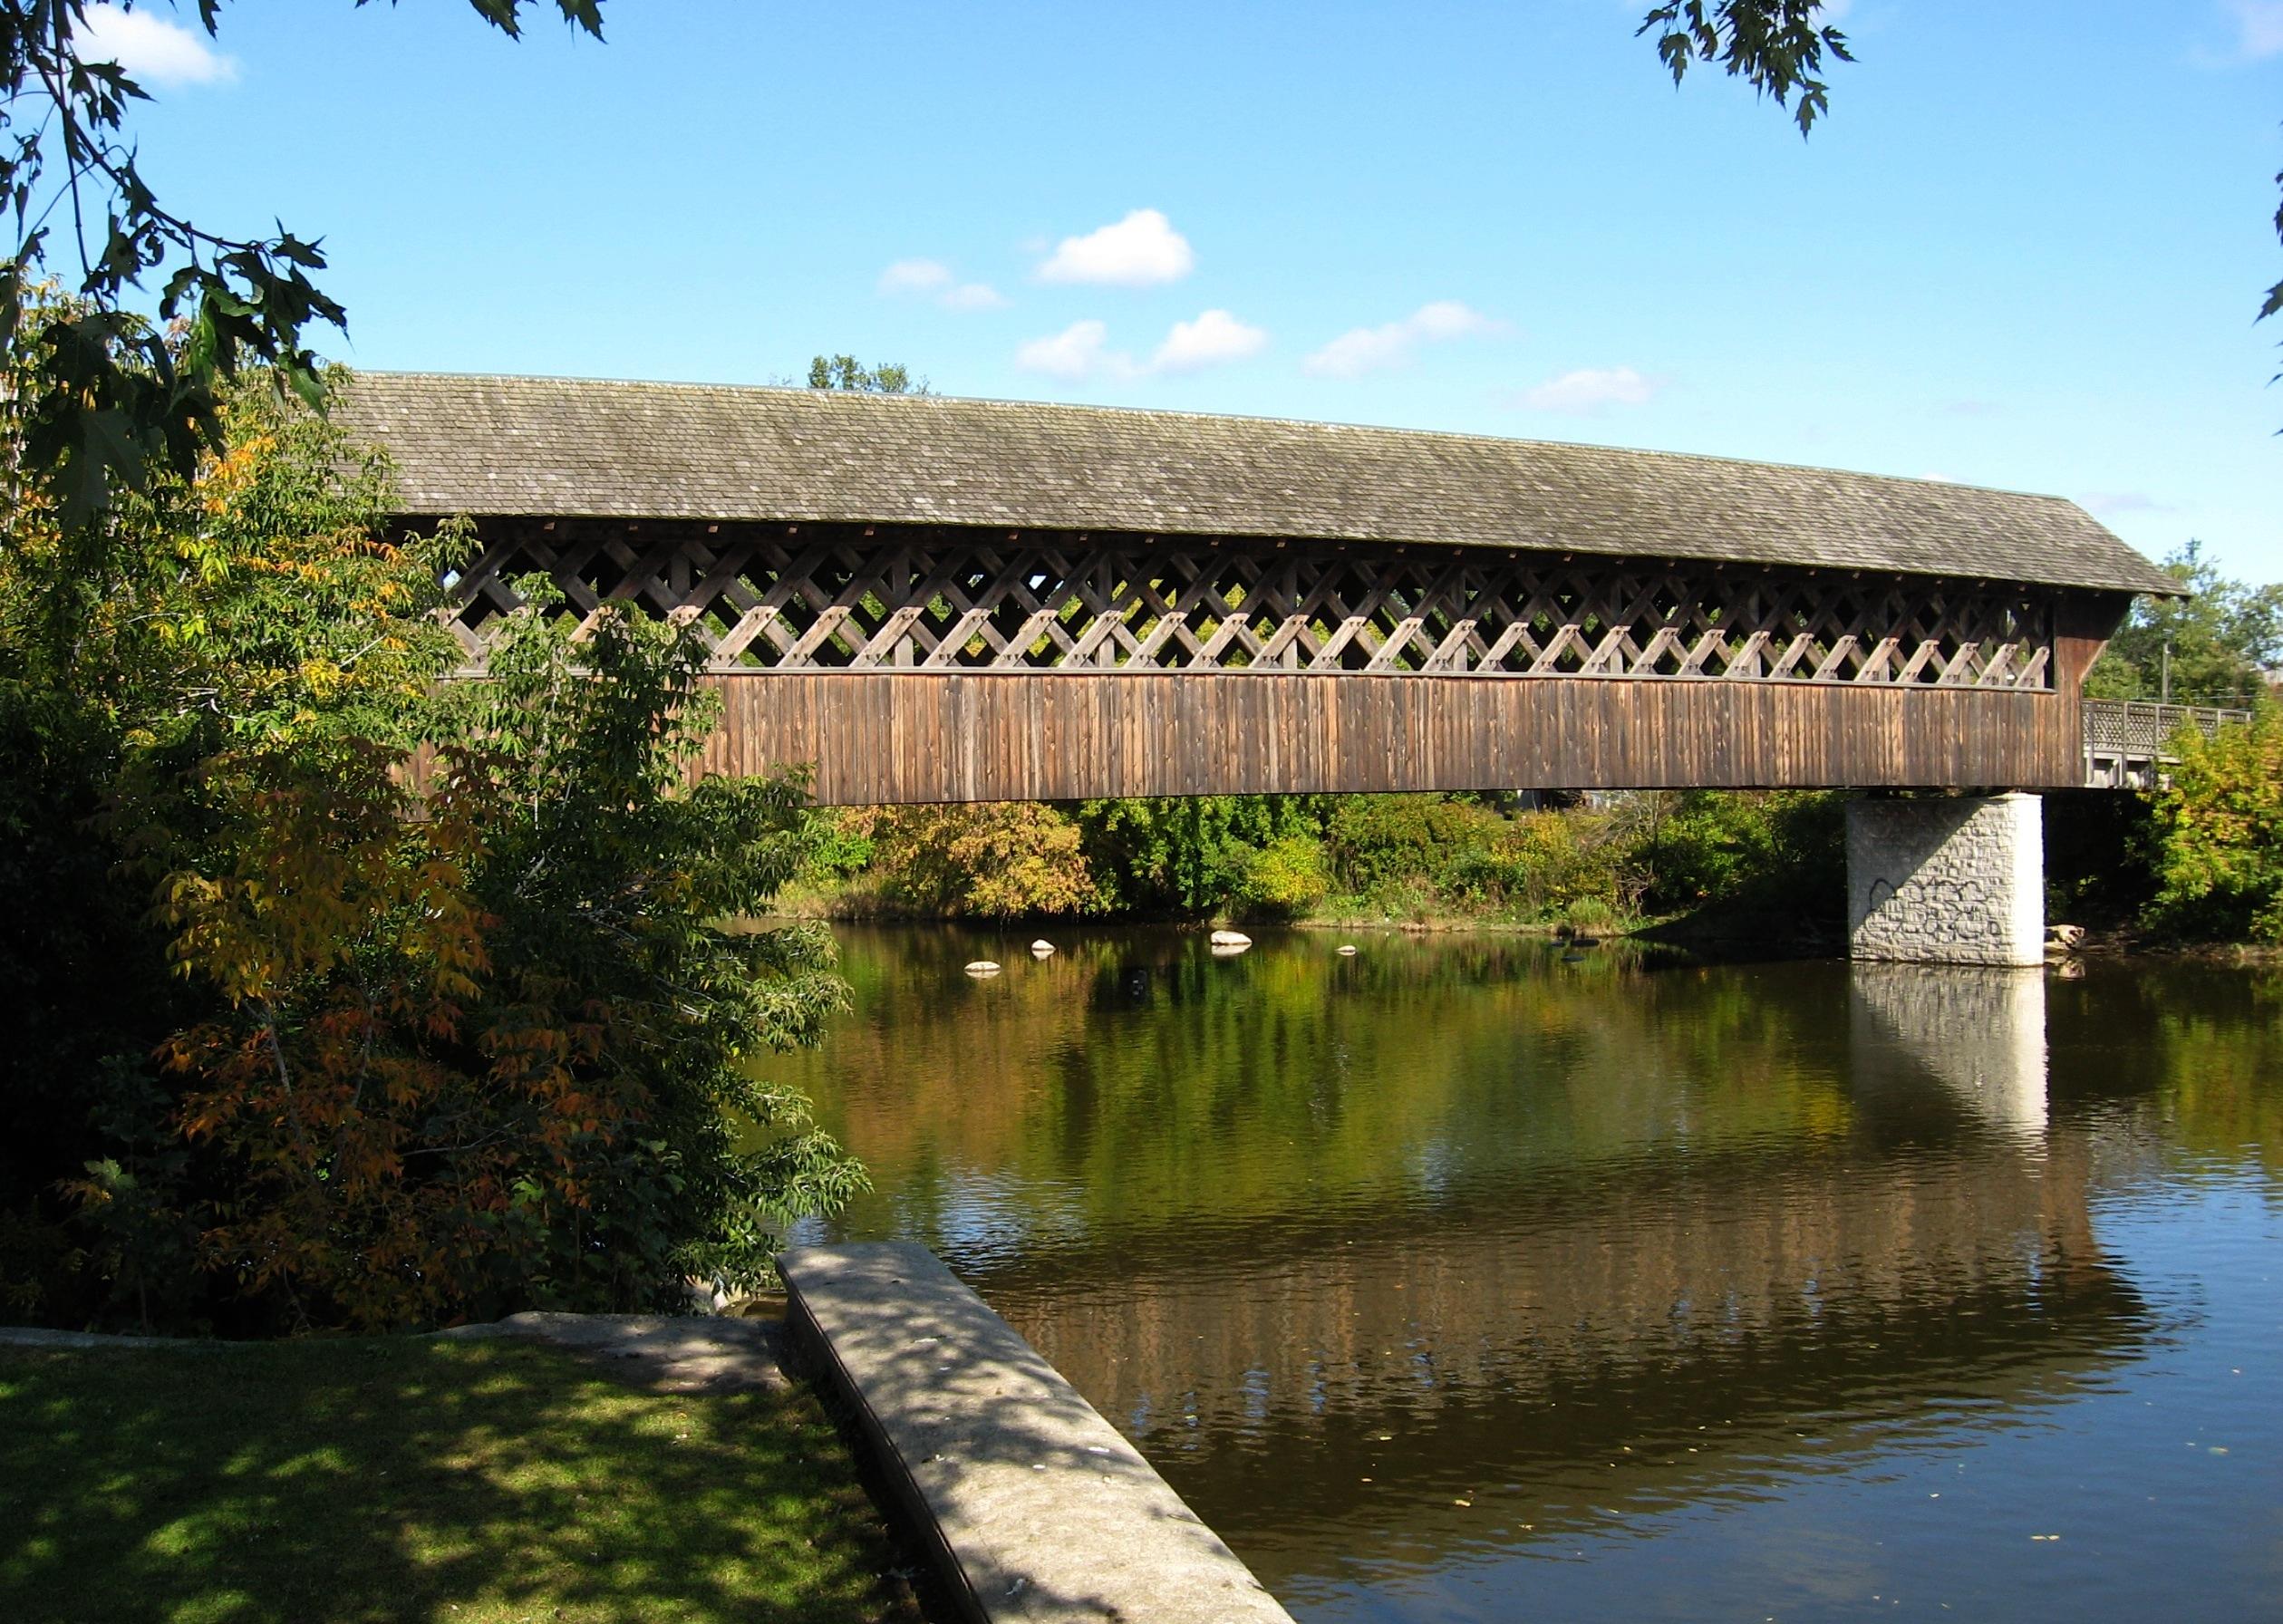 File:Guelph covered bridge.jpg - Wikimedia Commons